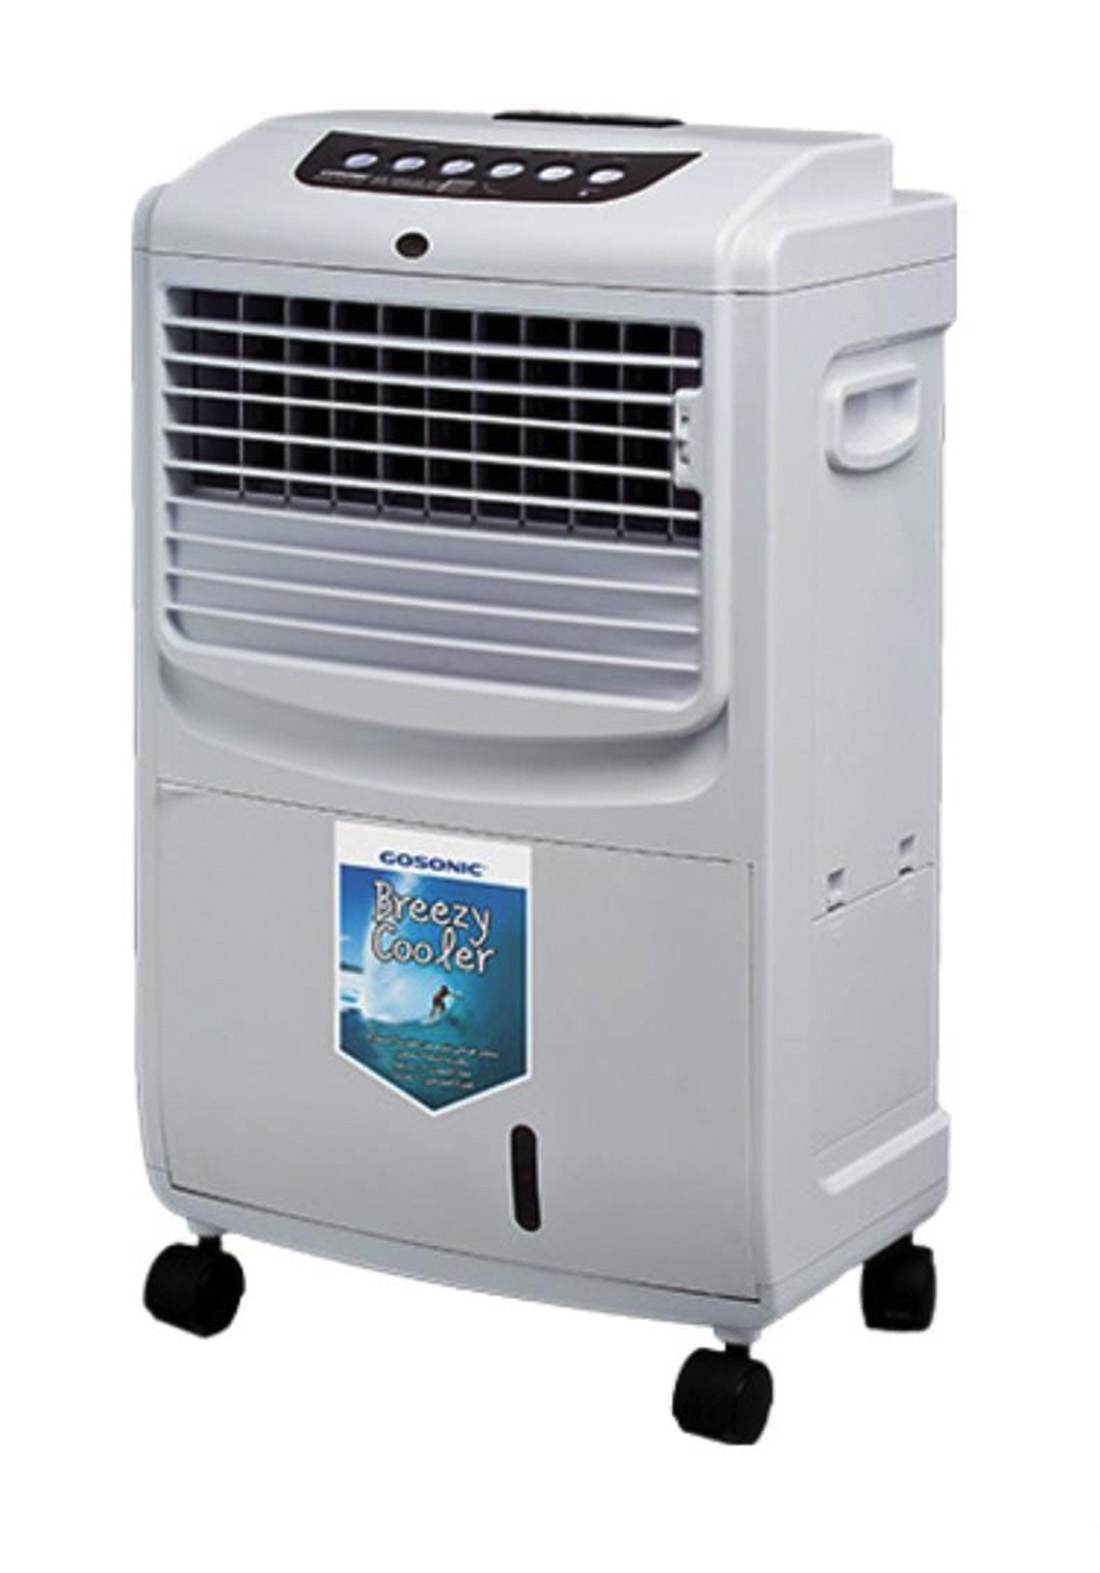 Gosonic Gac_3190 AC/DC Operated Air Cooler مبردة هواء